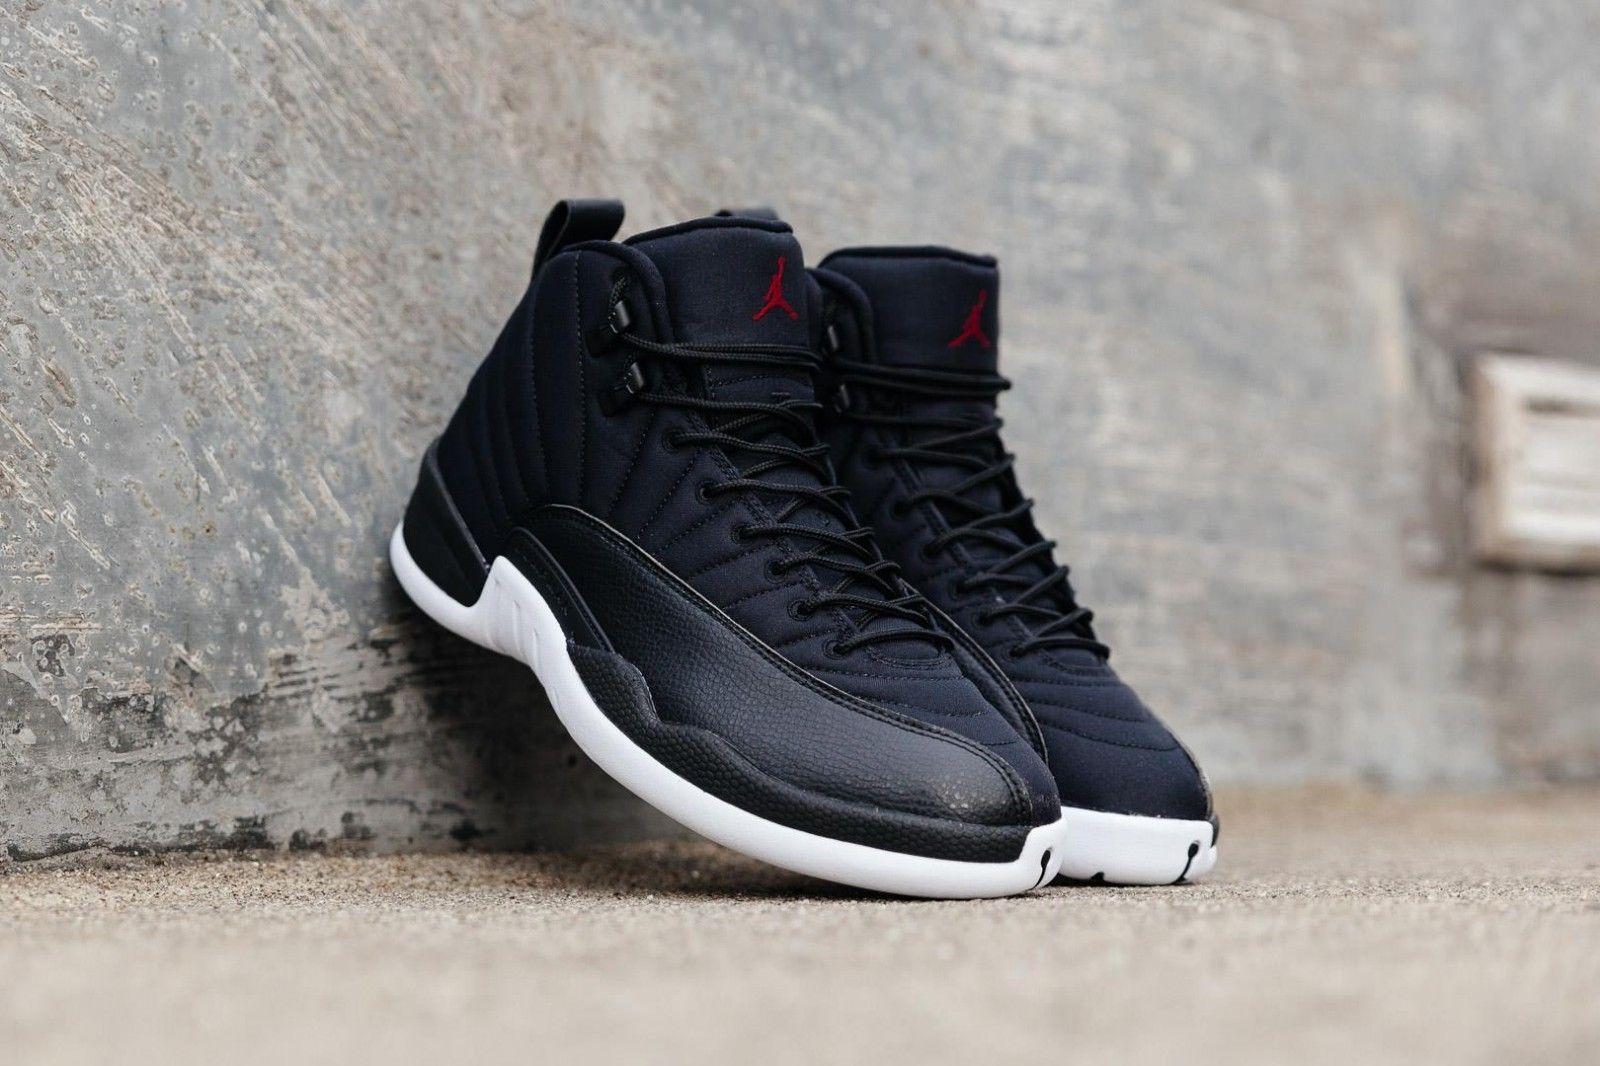 d0bd6d2b7b25ae Nike Air Jordan 12 Retro Black Nylon   and 50 similar items. S l1600